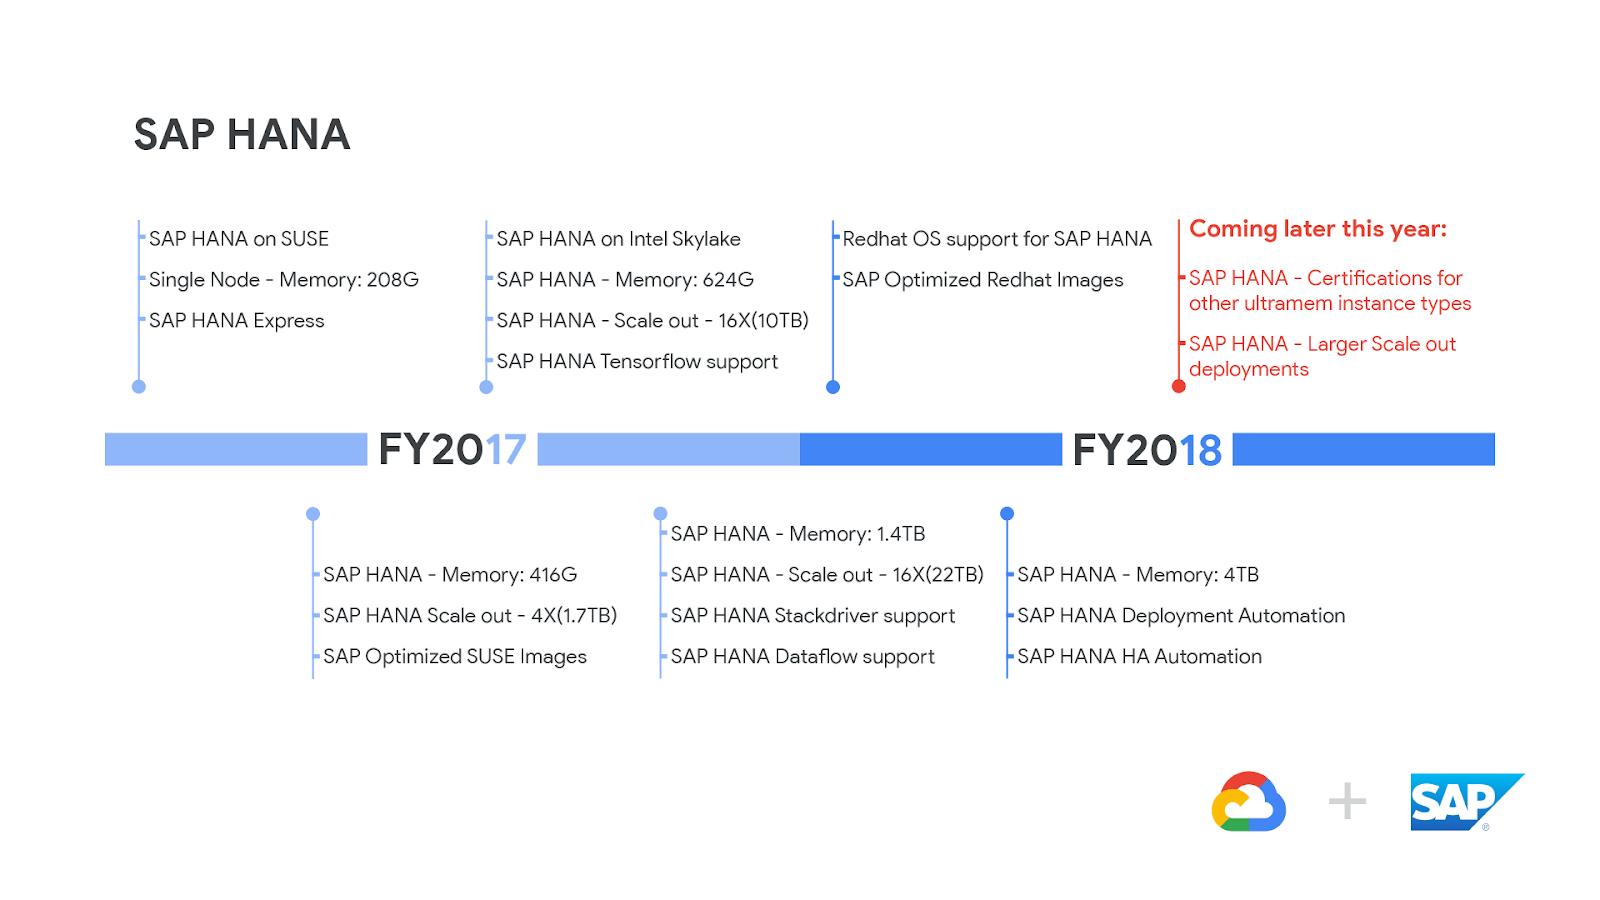 A closer look at the HANA ecosystem on Google Cloud Platform